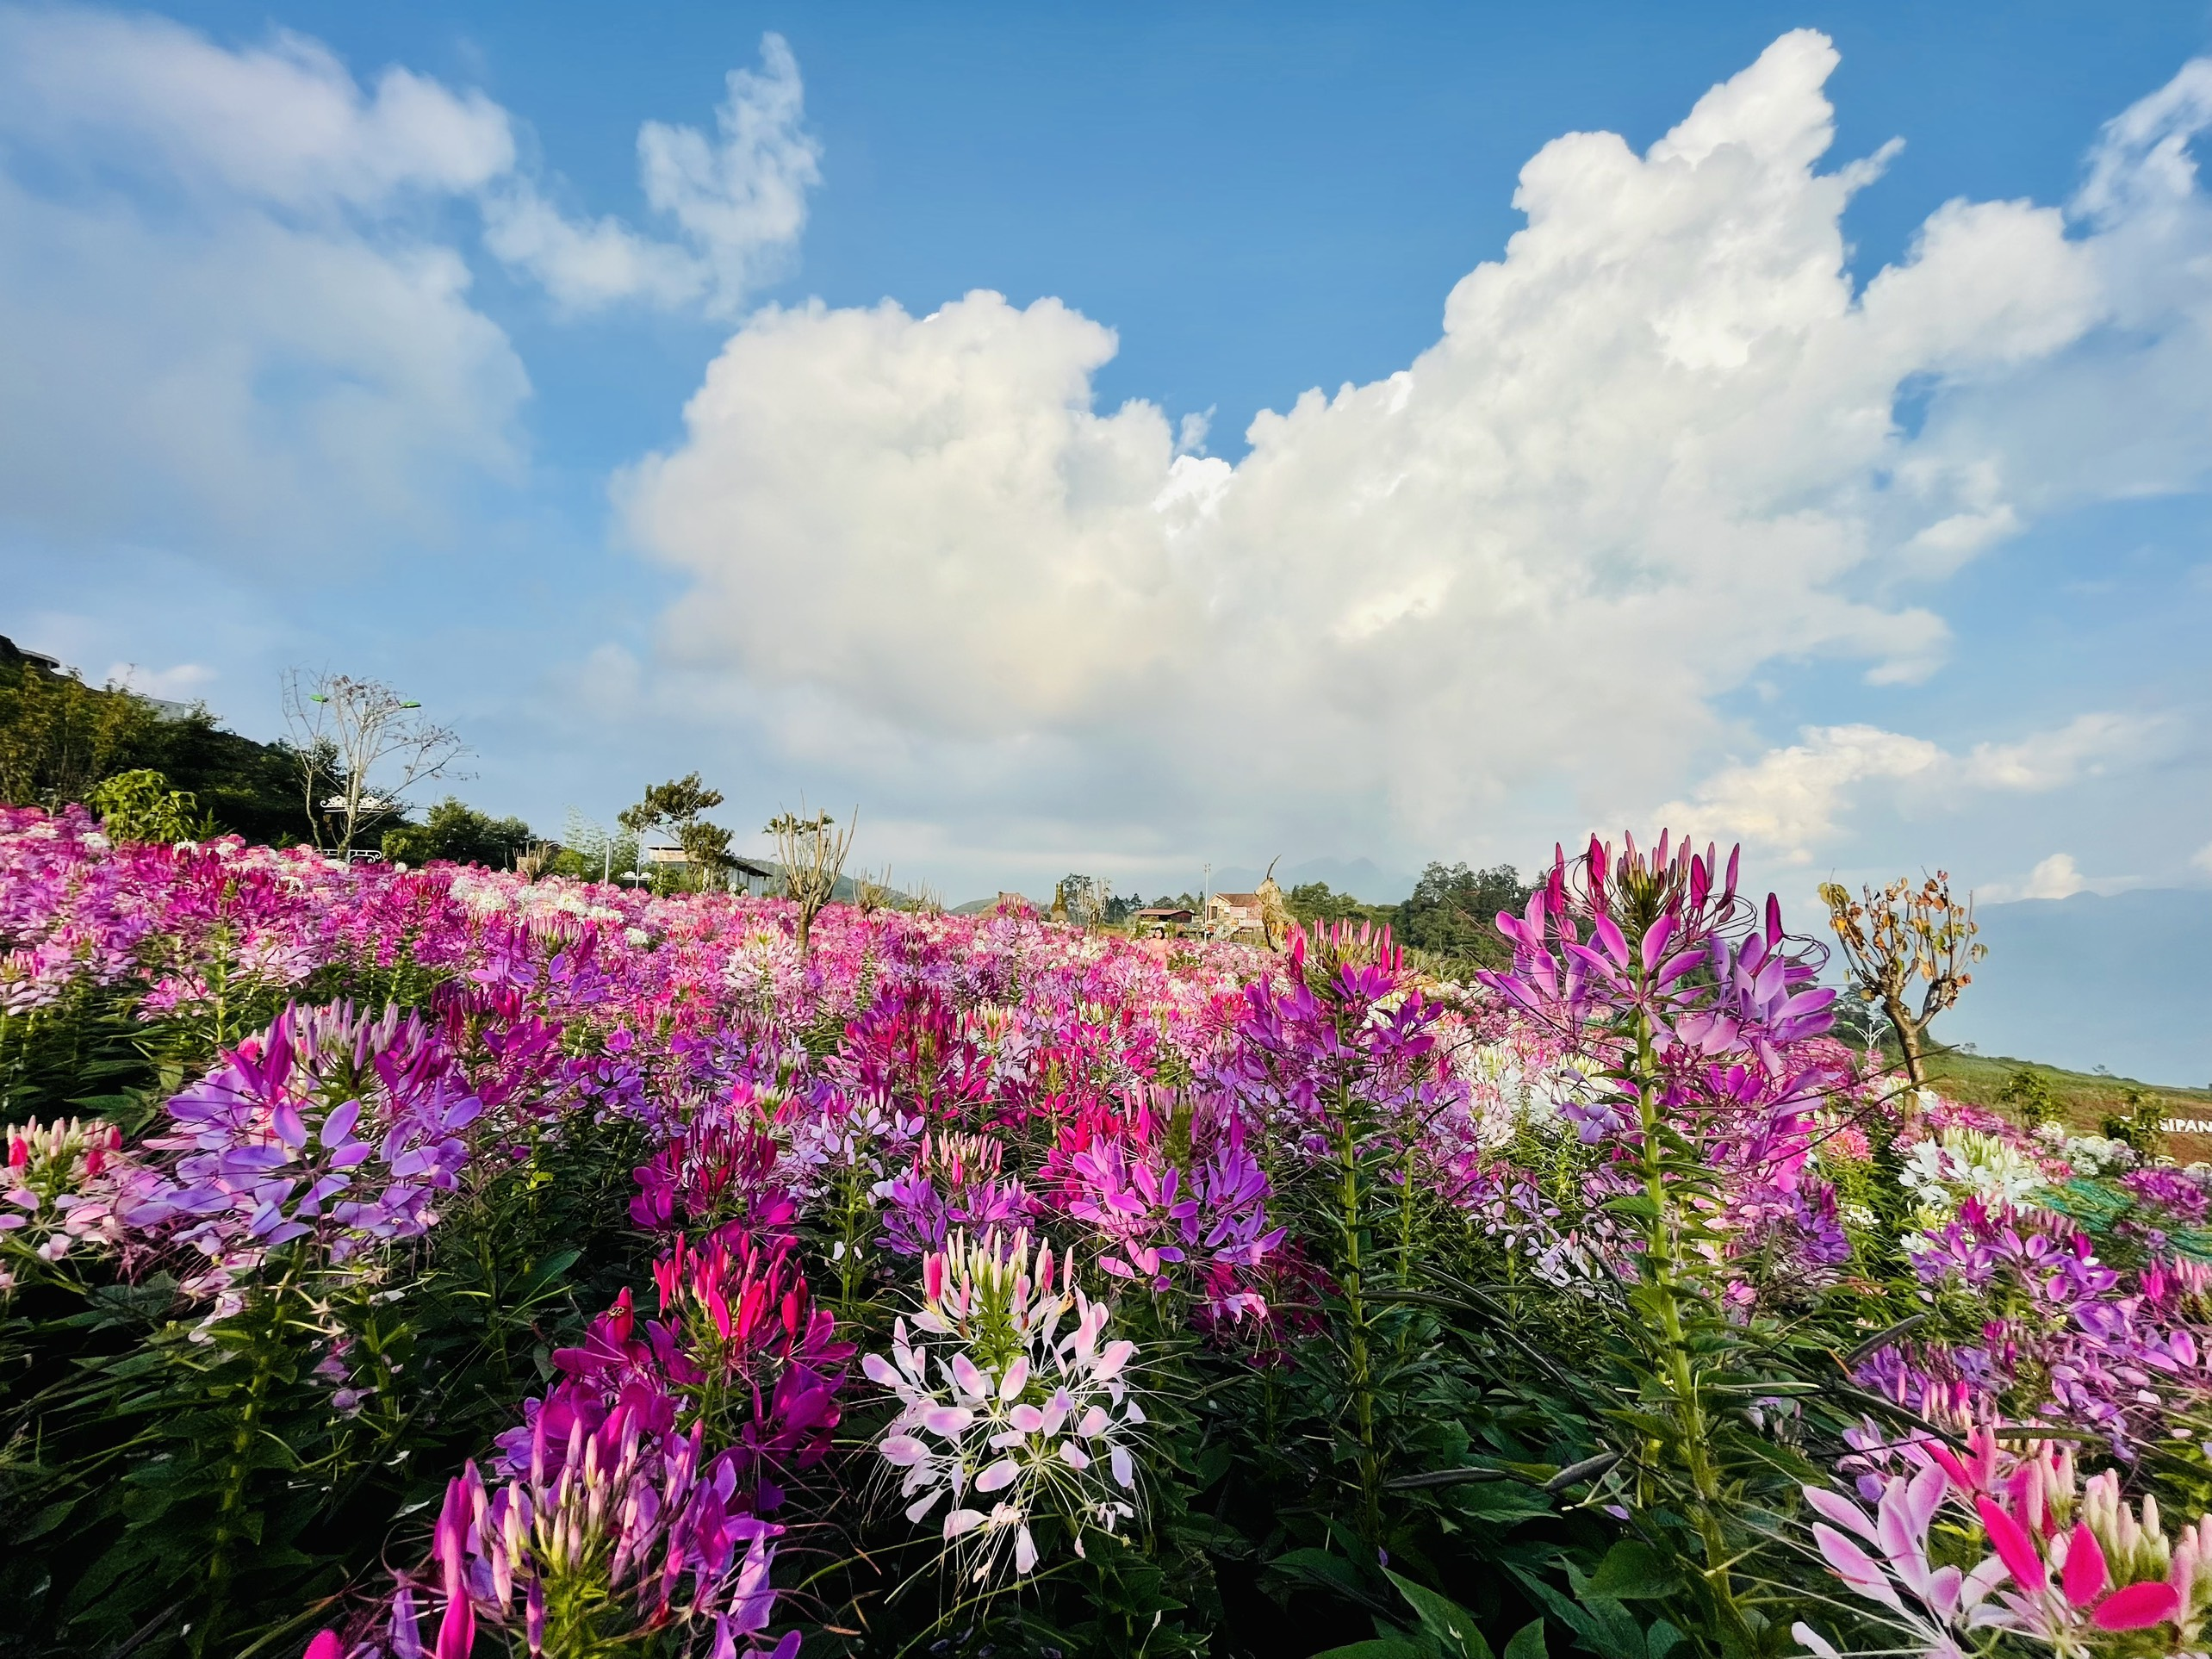 Lung linh sắc hoa ở Khu du lịch Sunworld Fansipan Legend Sa Pa